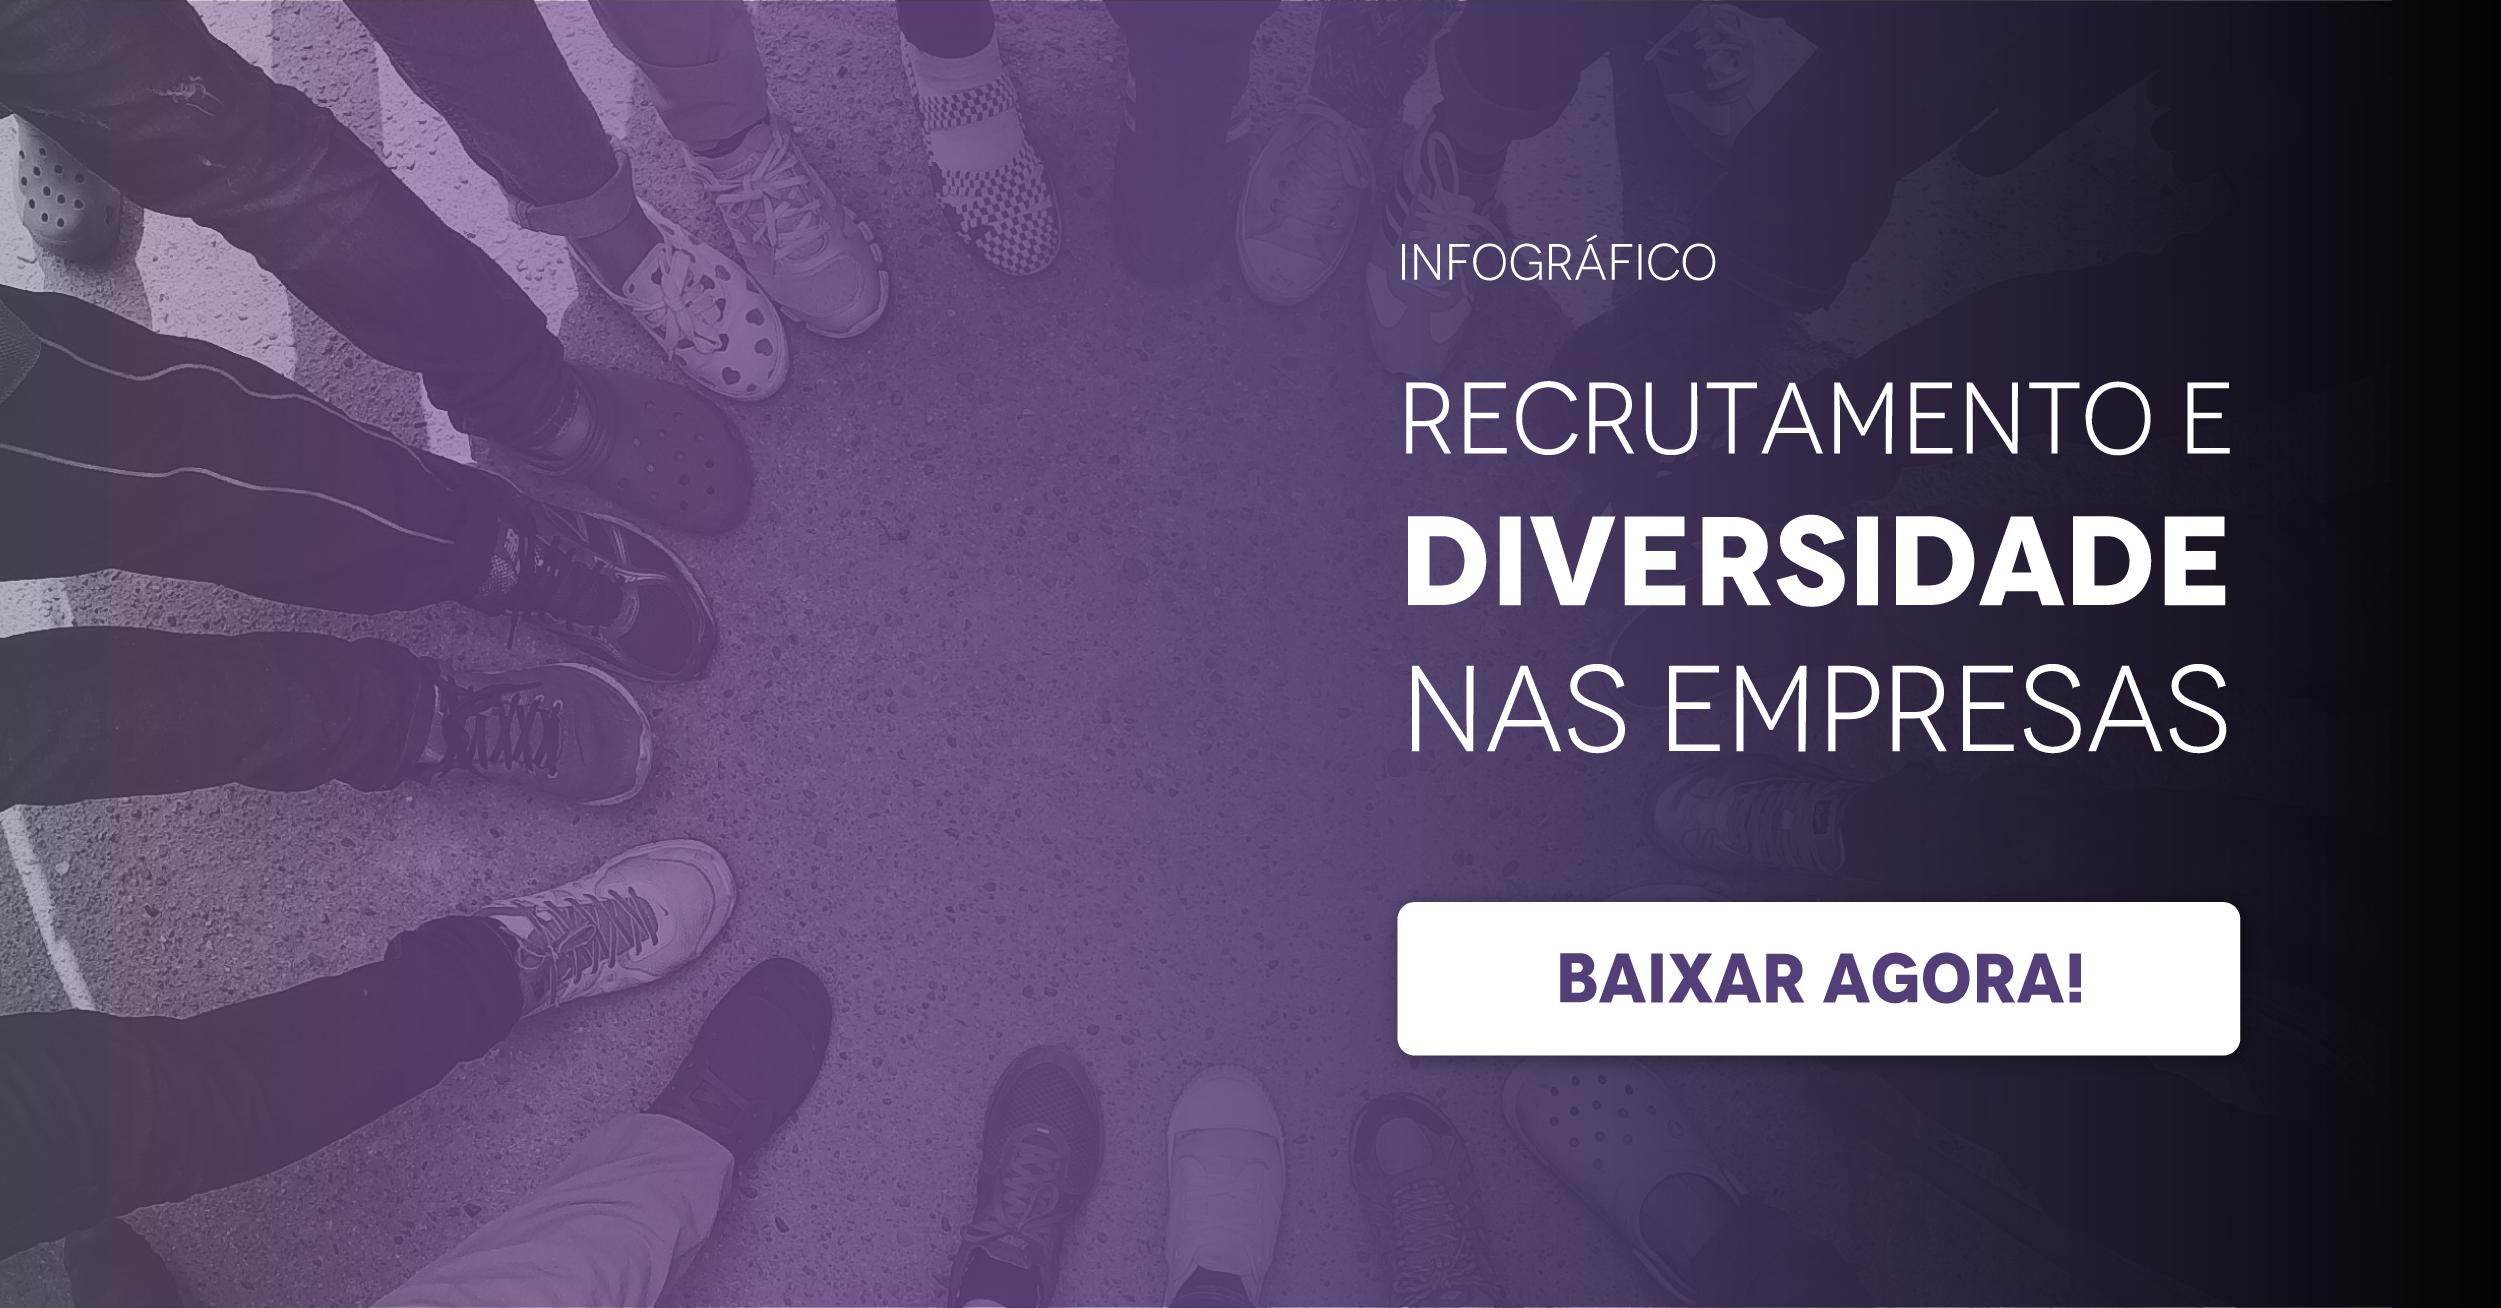 Material Recrutamento e diversidade nas empresas